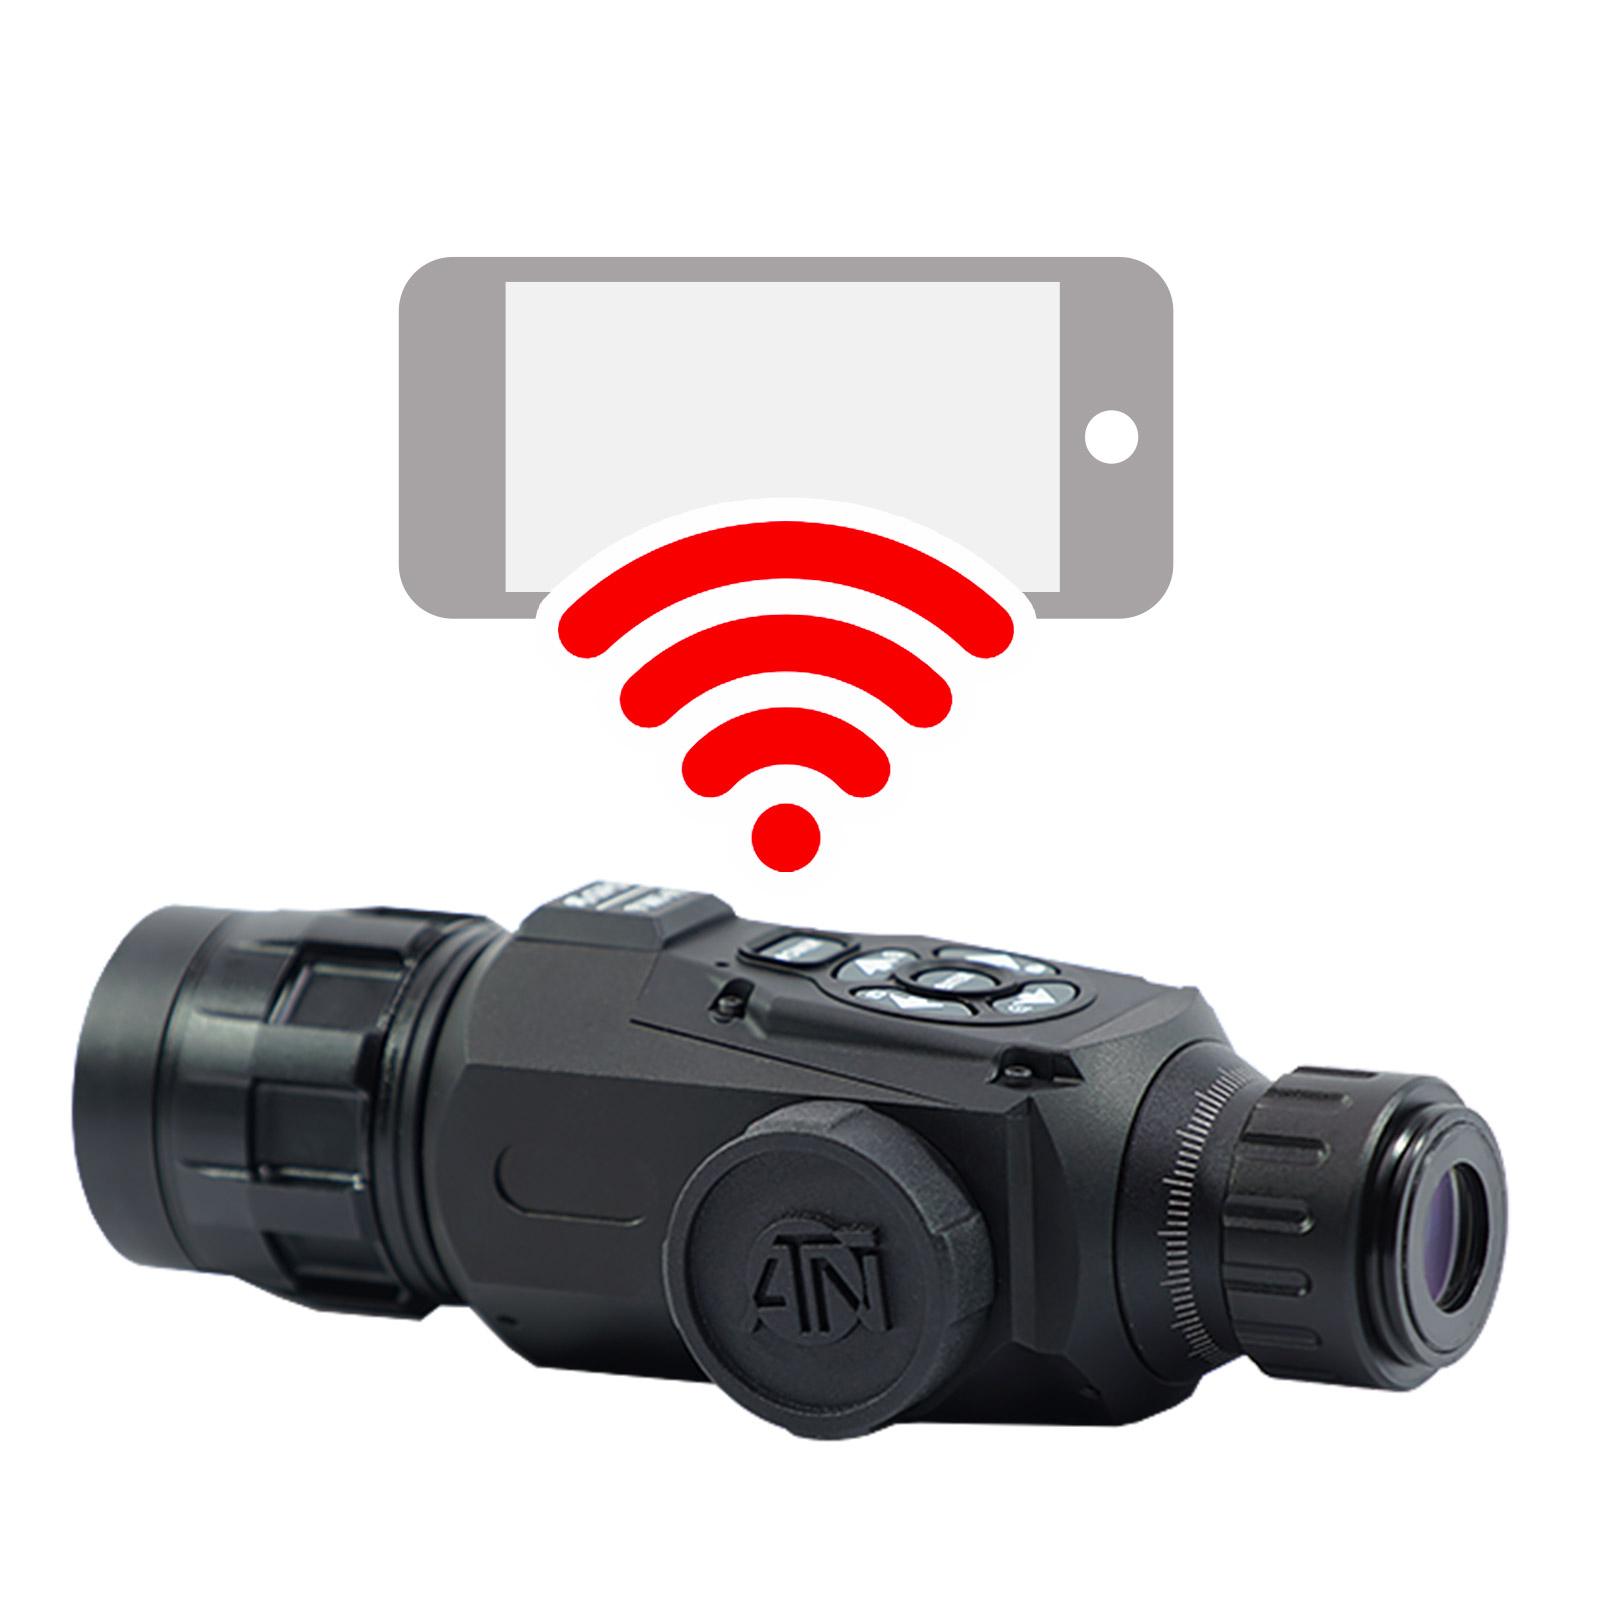 ATN OTS-HD Monocular, 2.5-25×50